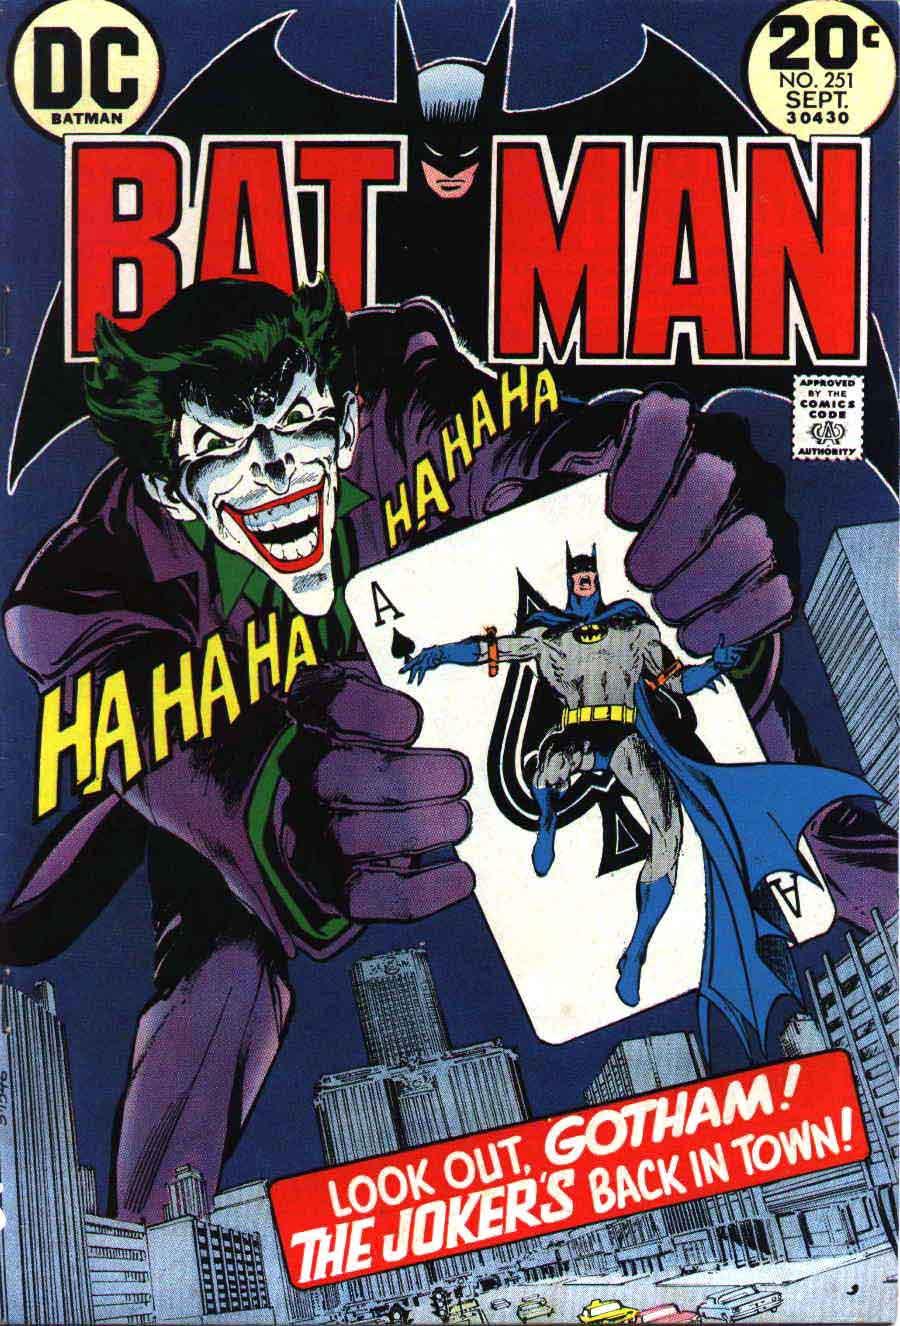 Batman #251 bronze age 1970s dc classic Joker comic book cover art by Neal Adams